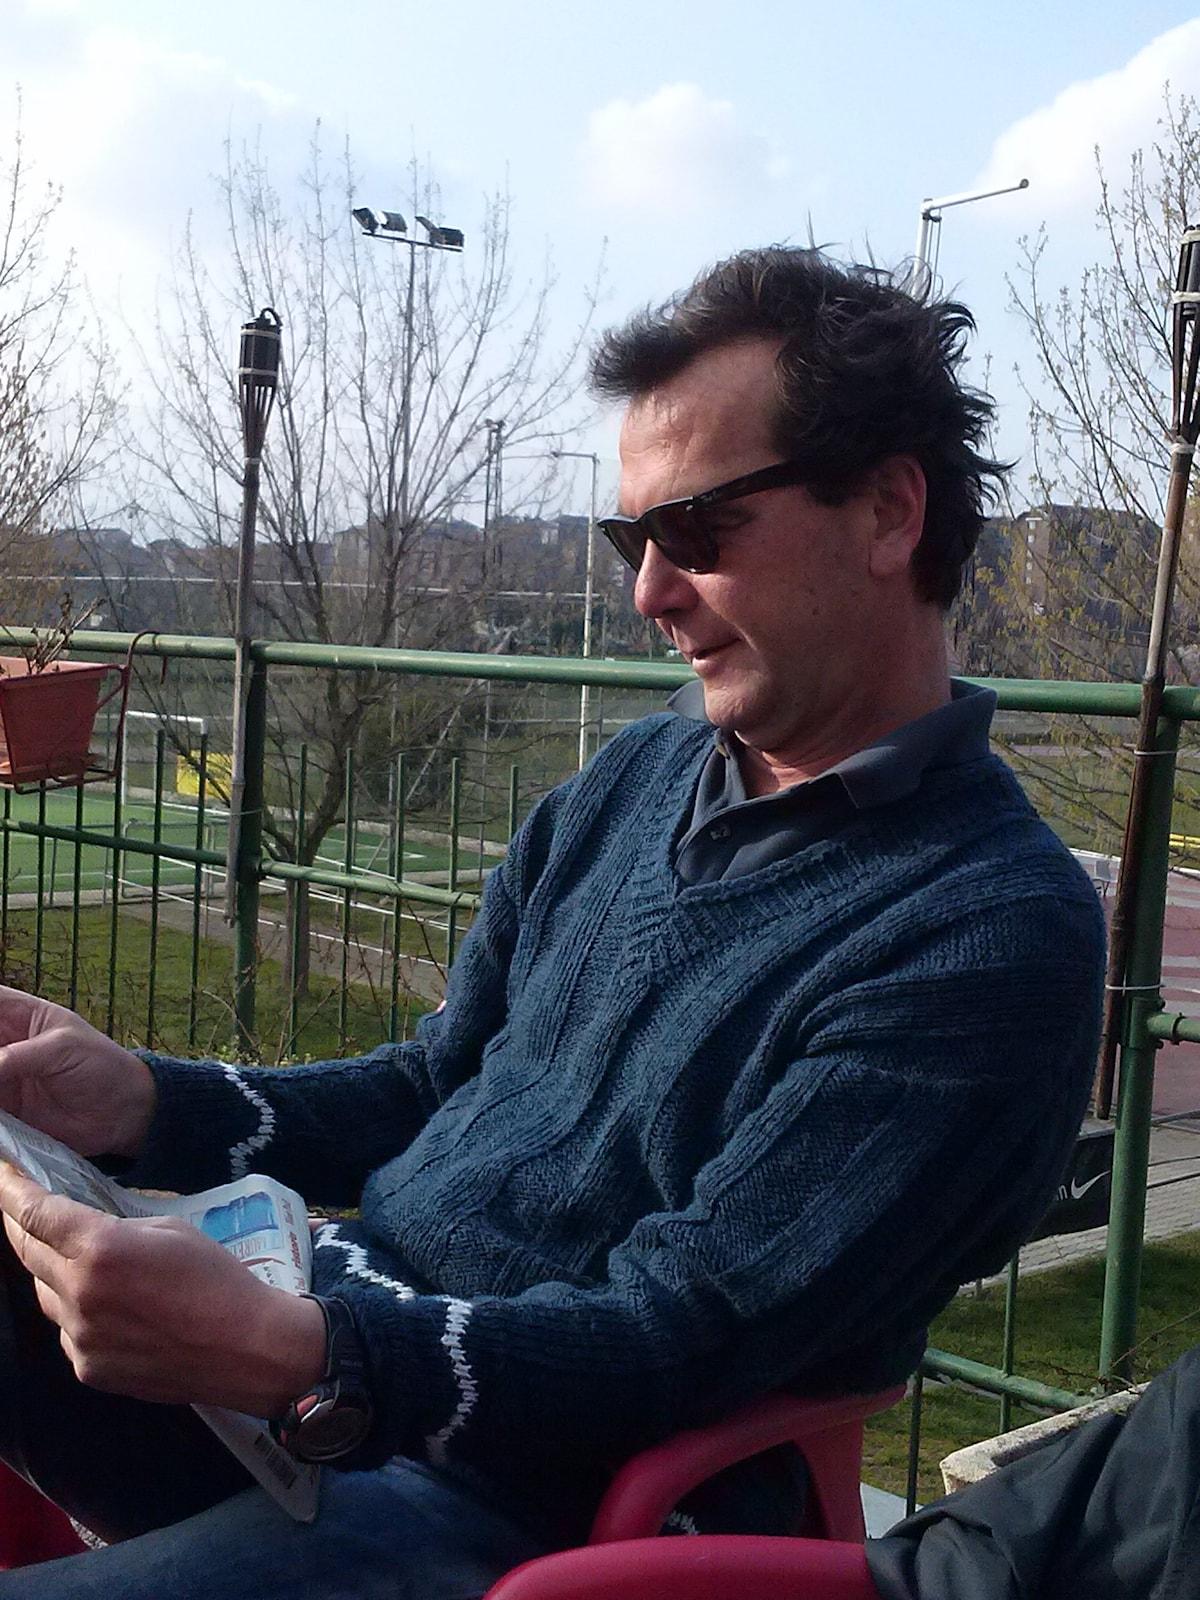 Carlo from Torino